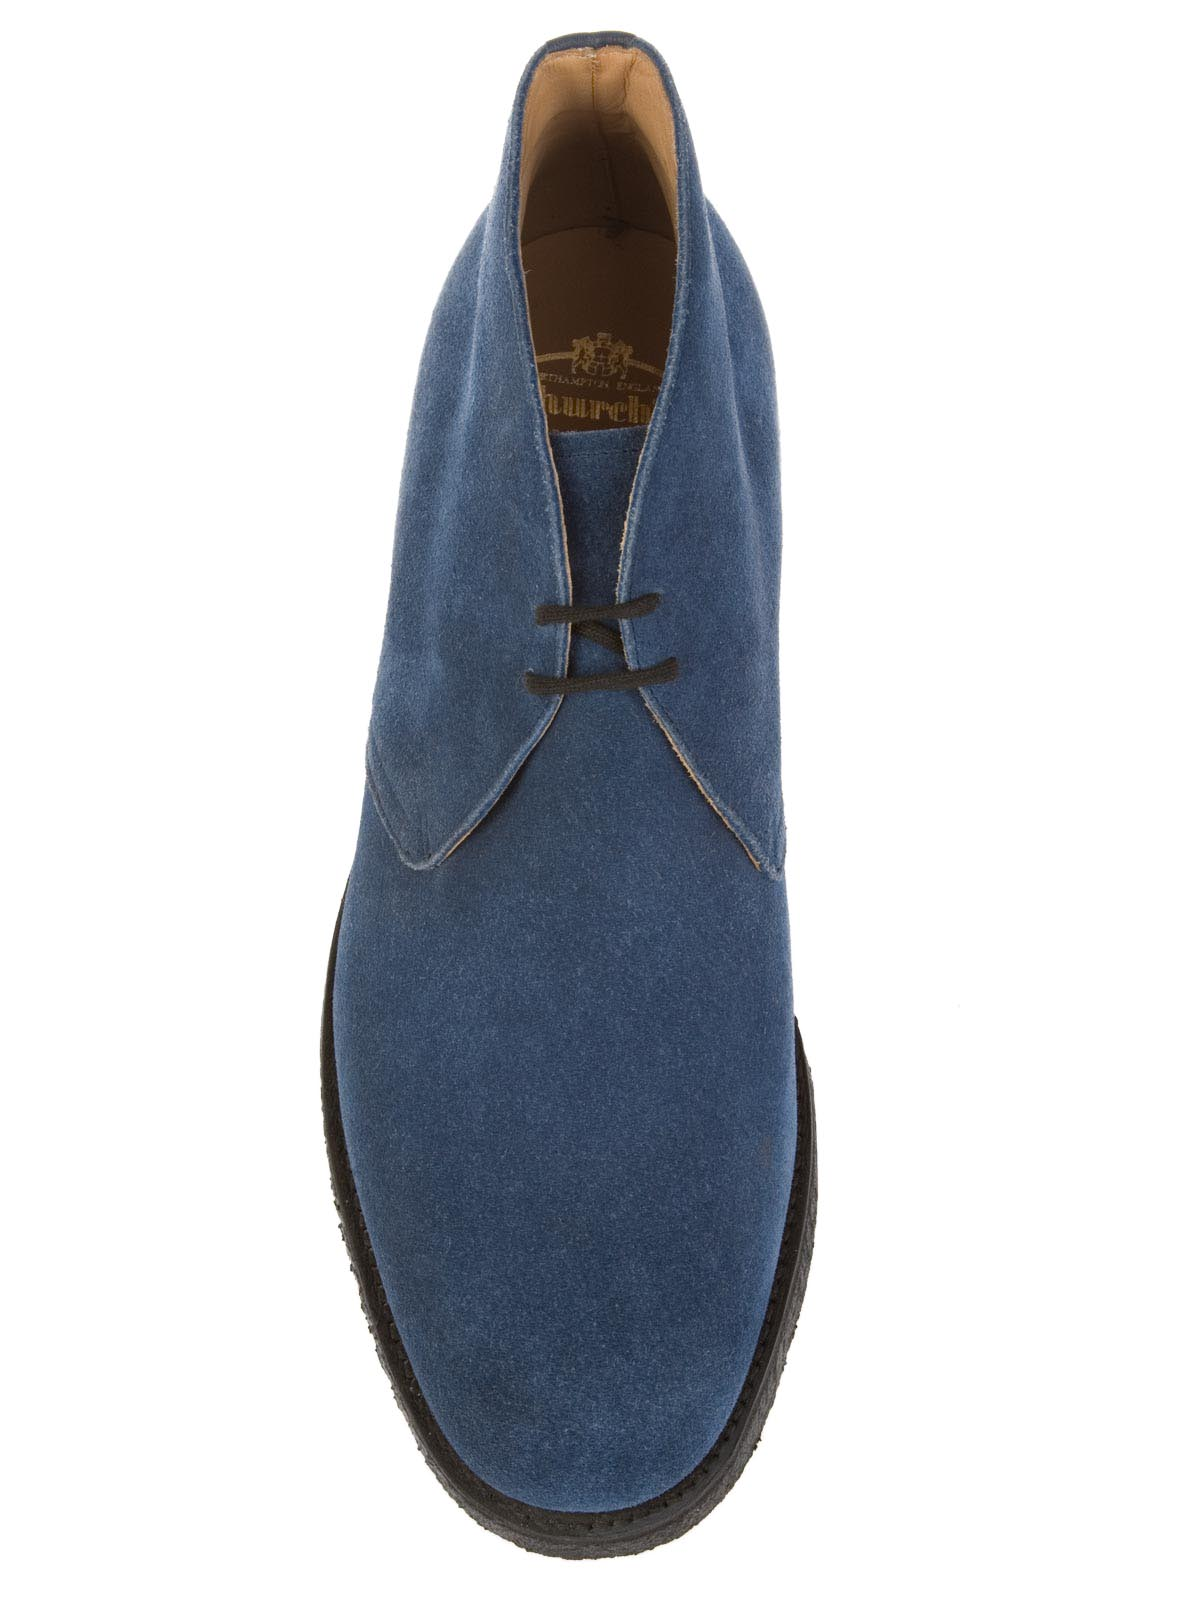 Picture of CHURCH'S | Men's Ryder Castoro Shoe